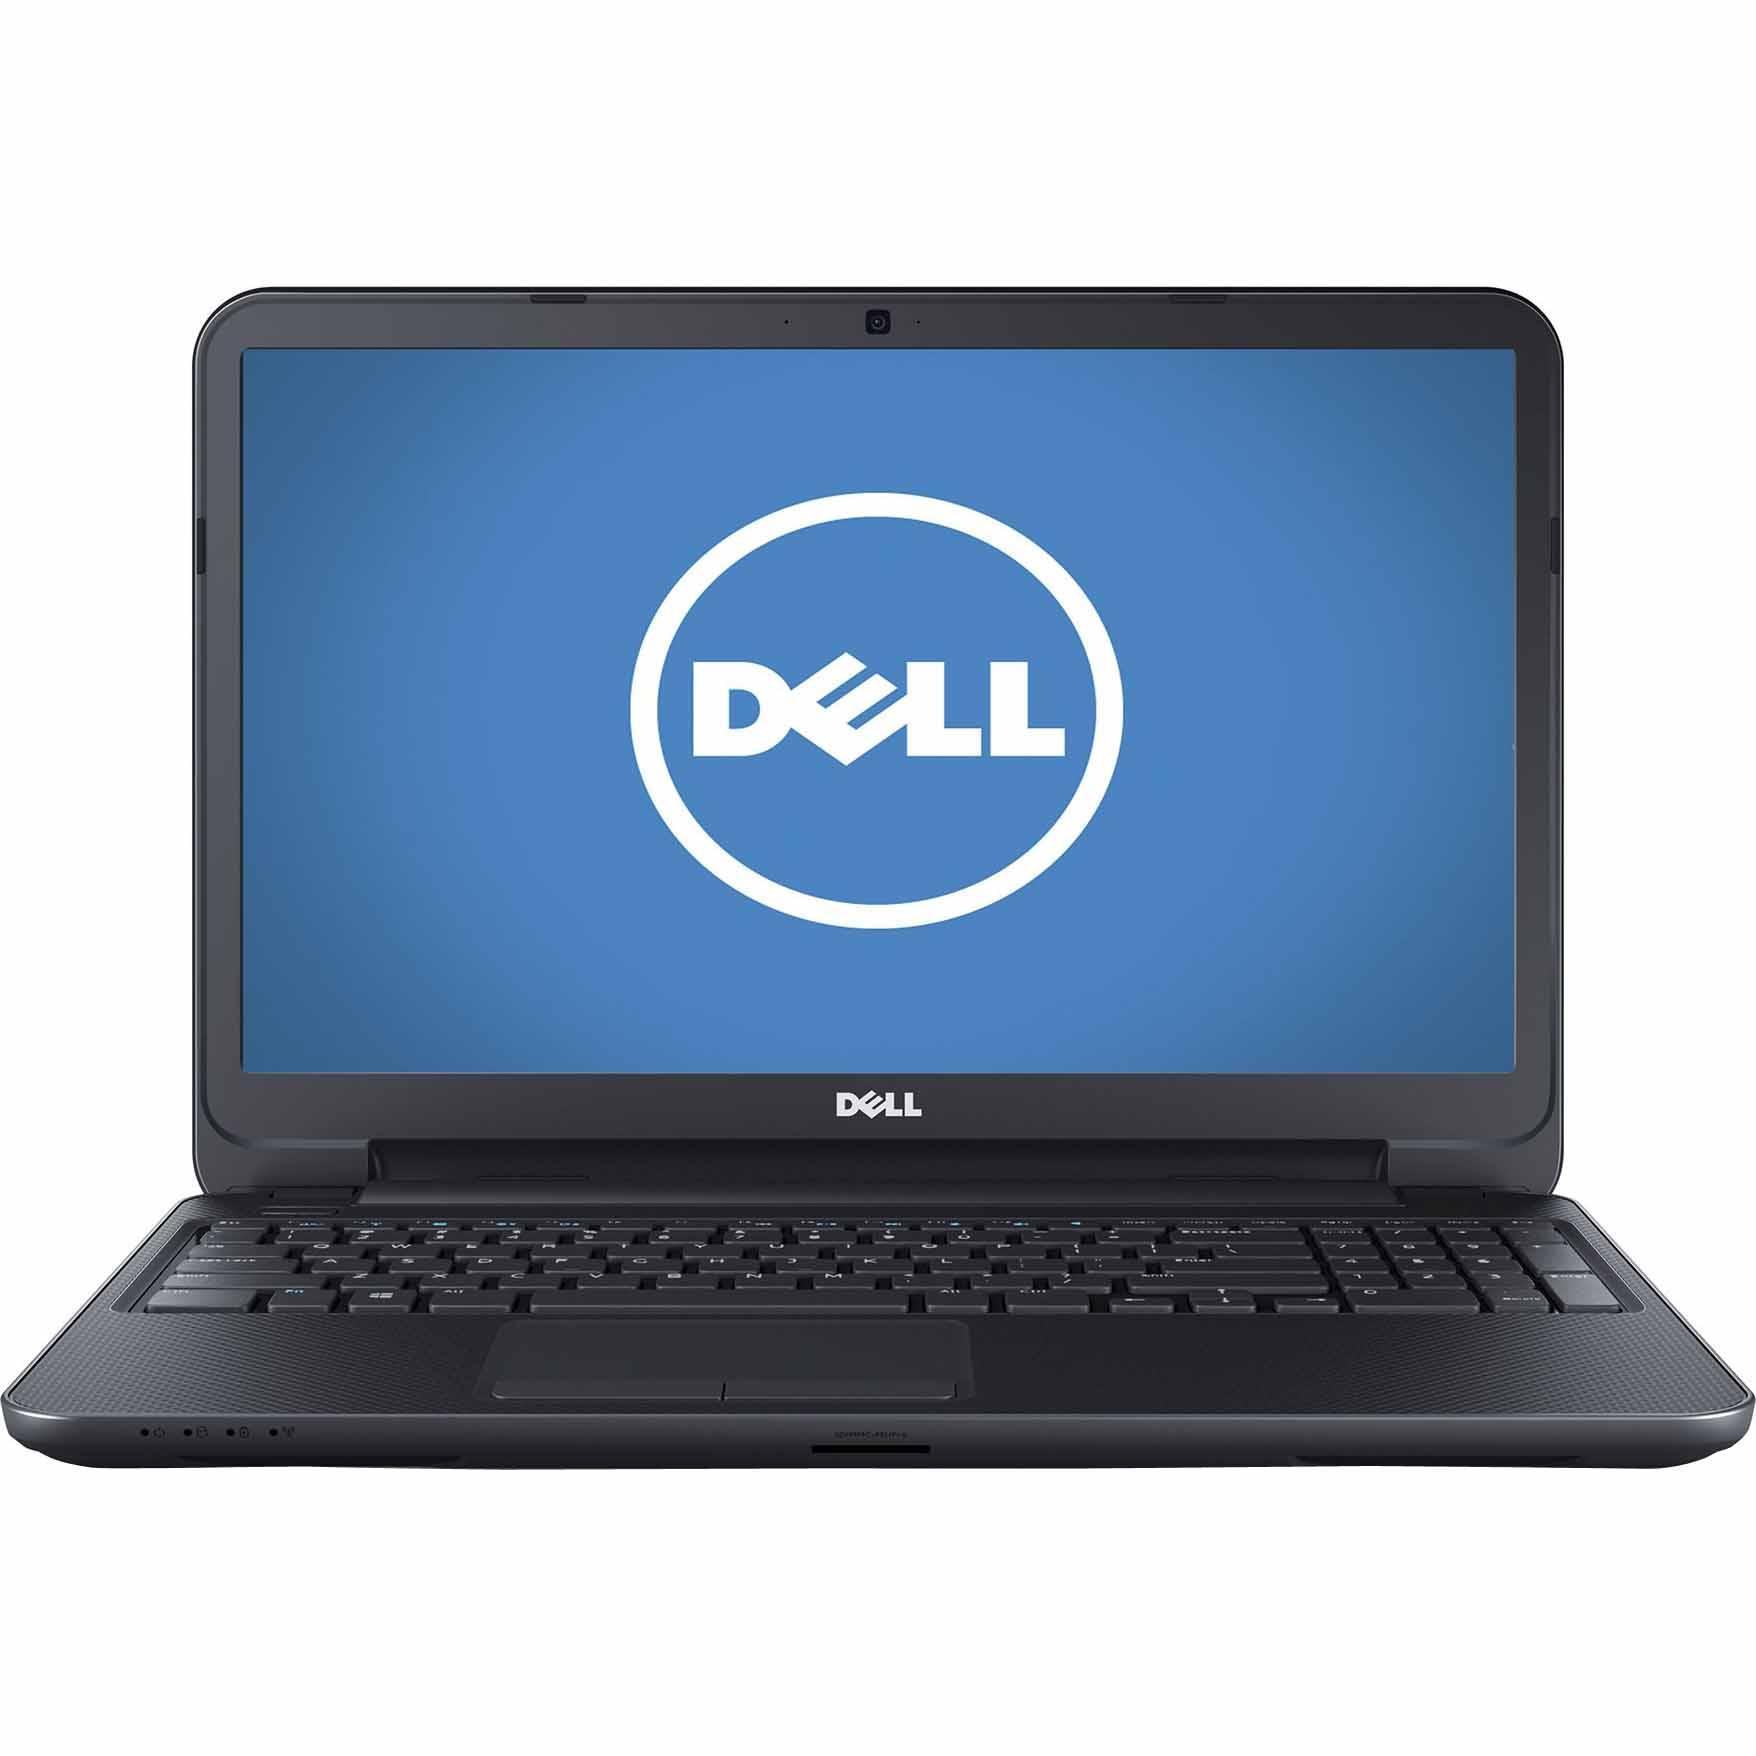 "4GB 15.6"" Display Intel Celeron Dual Core N2830 Processor Notebook Black"